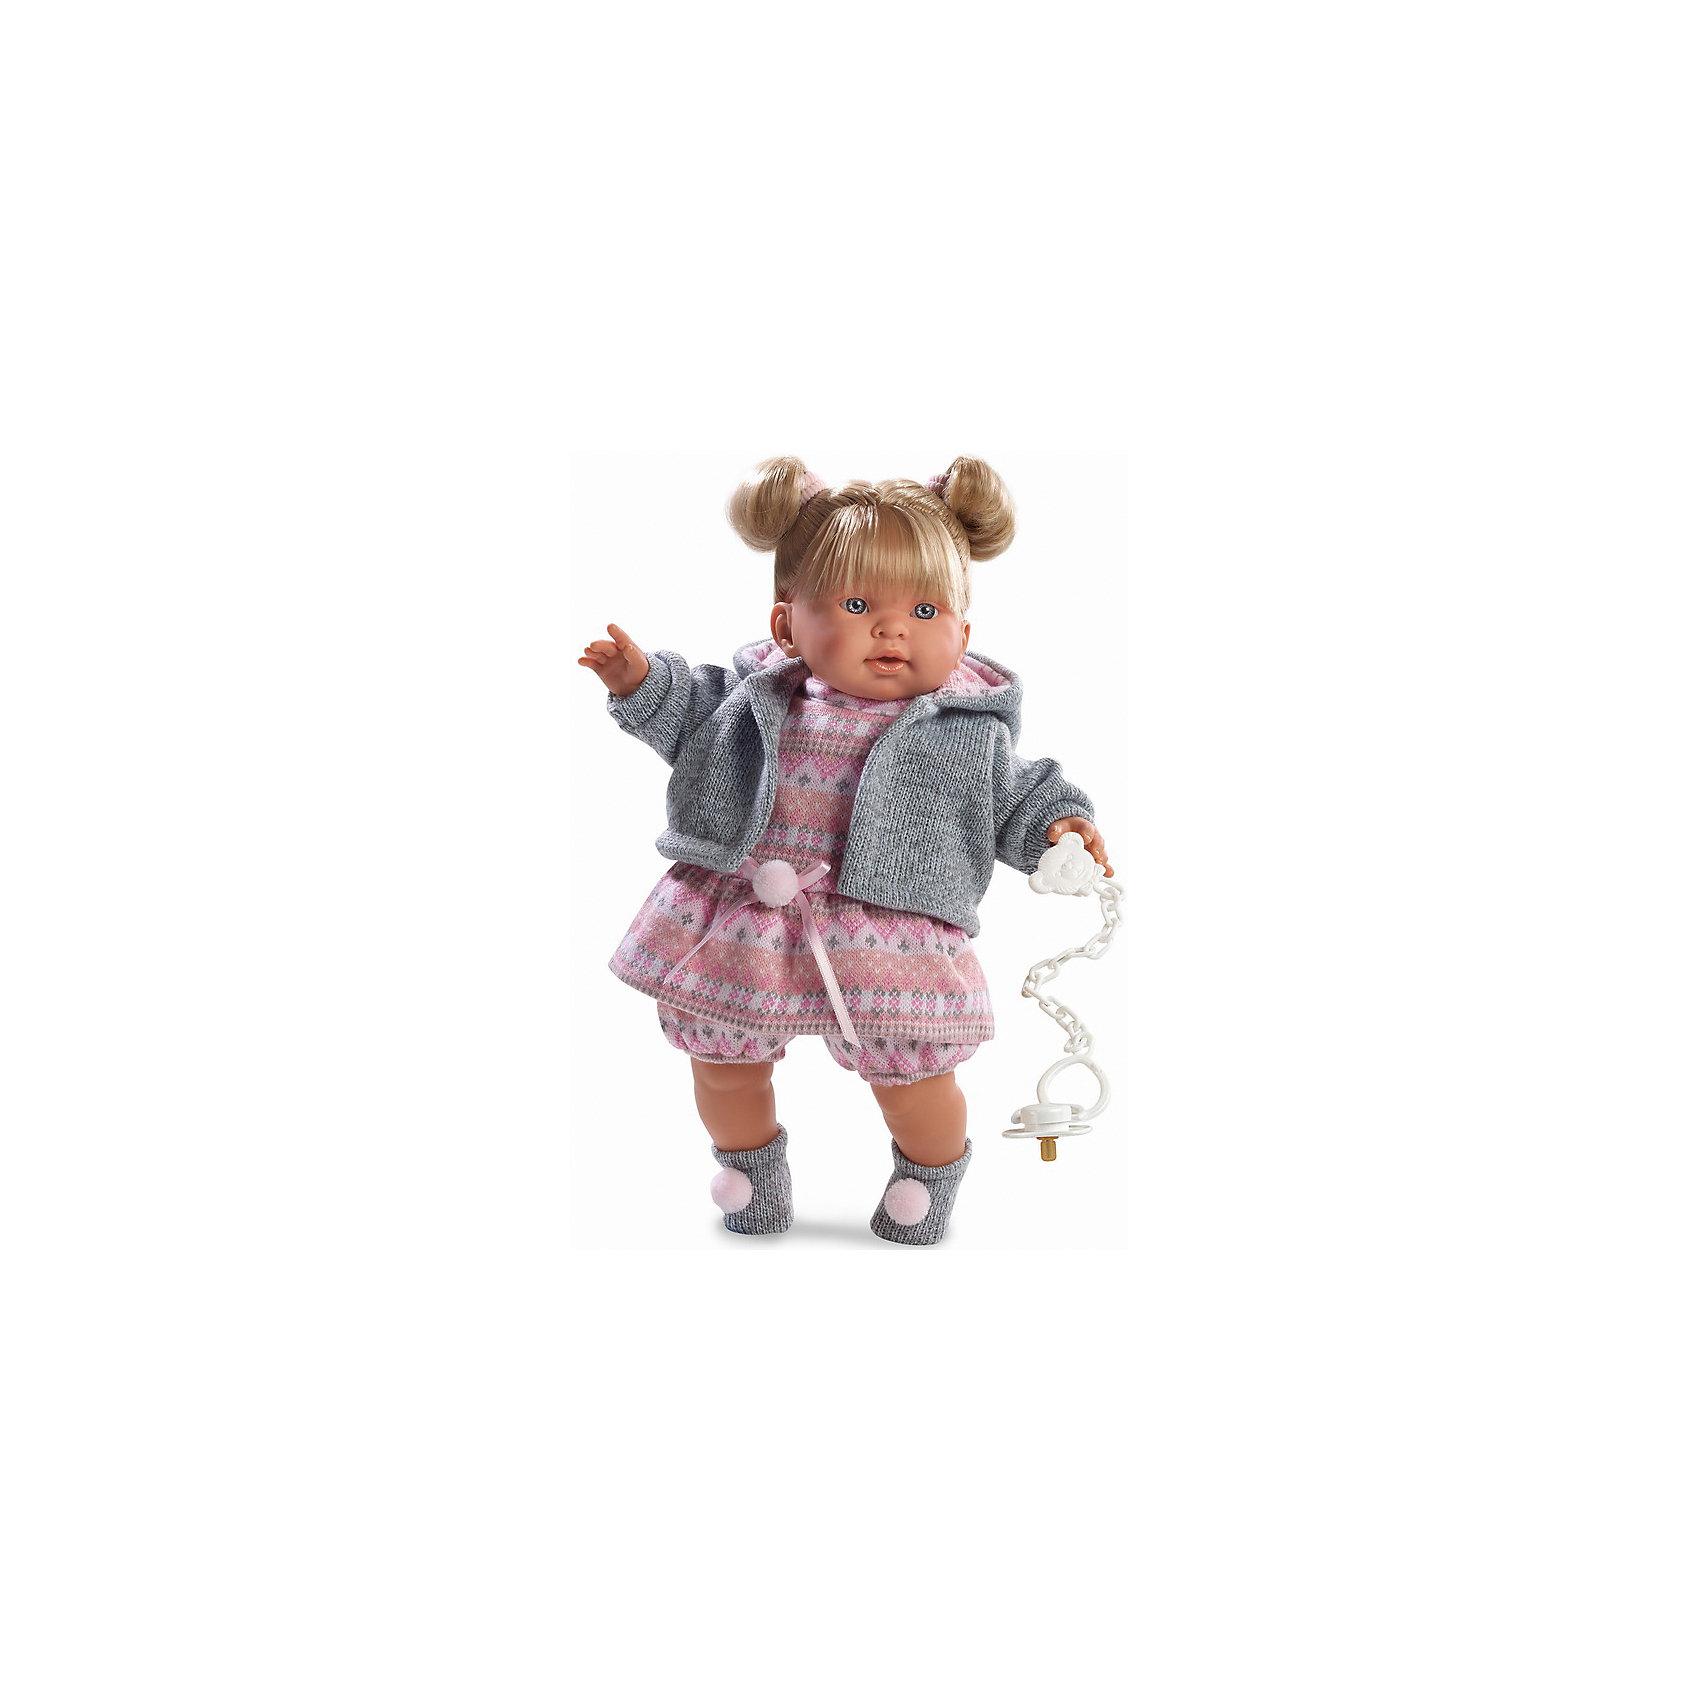 Llorens Кукла Тина, 42 см, Llorens куклы и одежда для кукол llorens кукла изабела 33 см со звуком